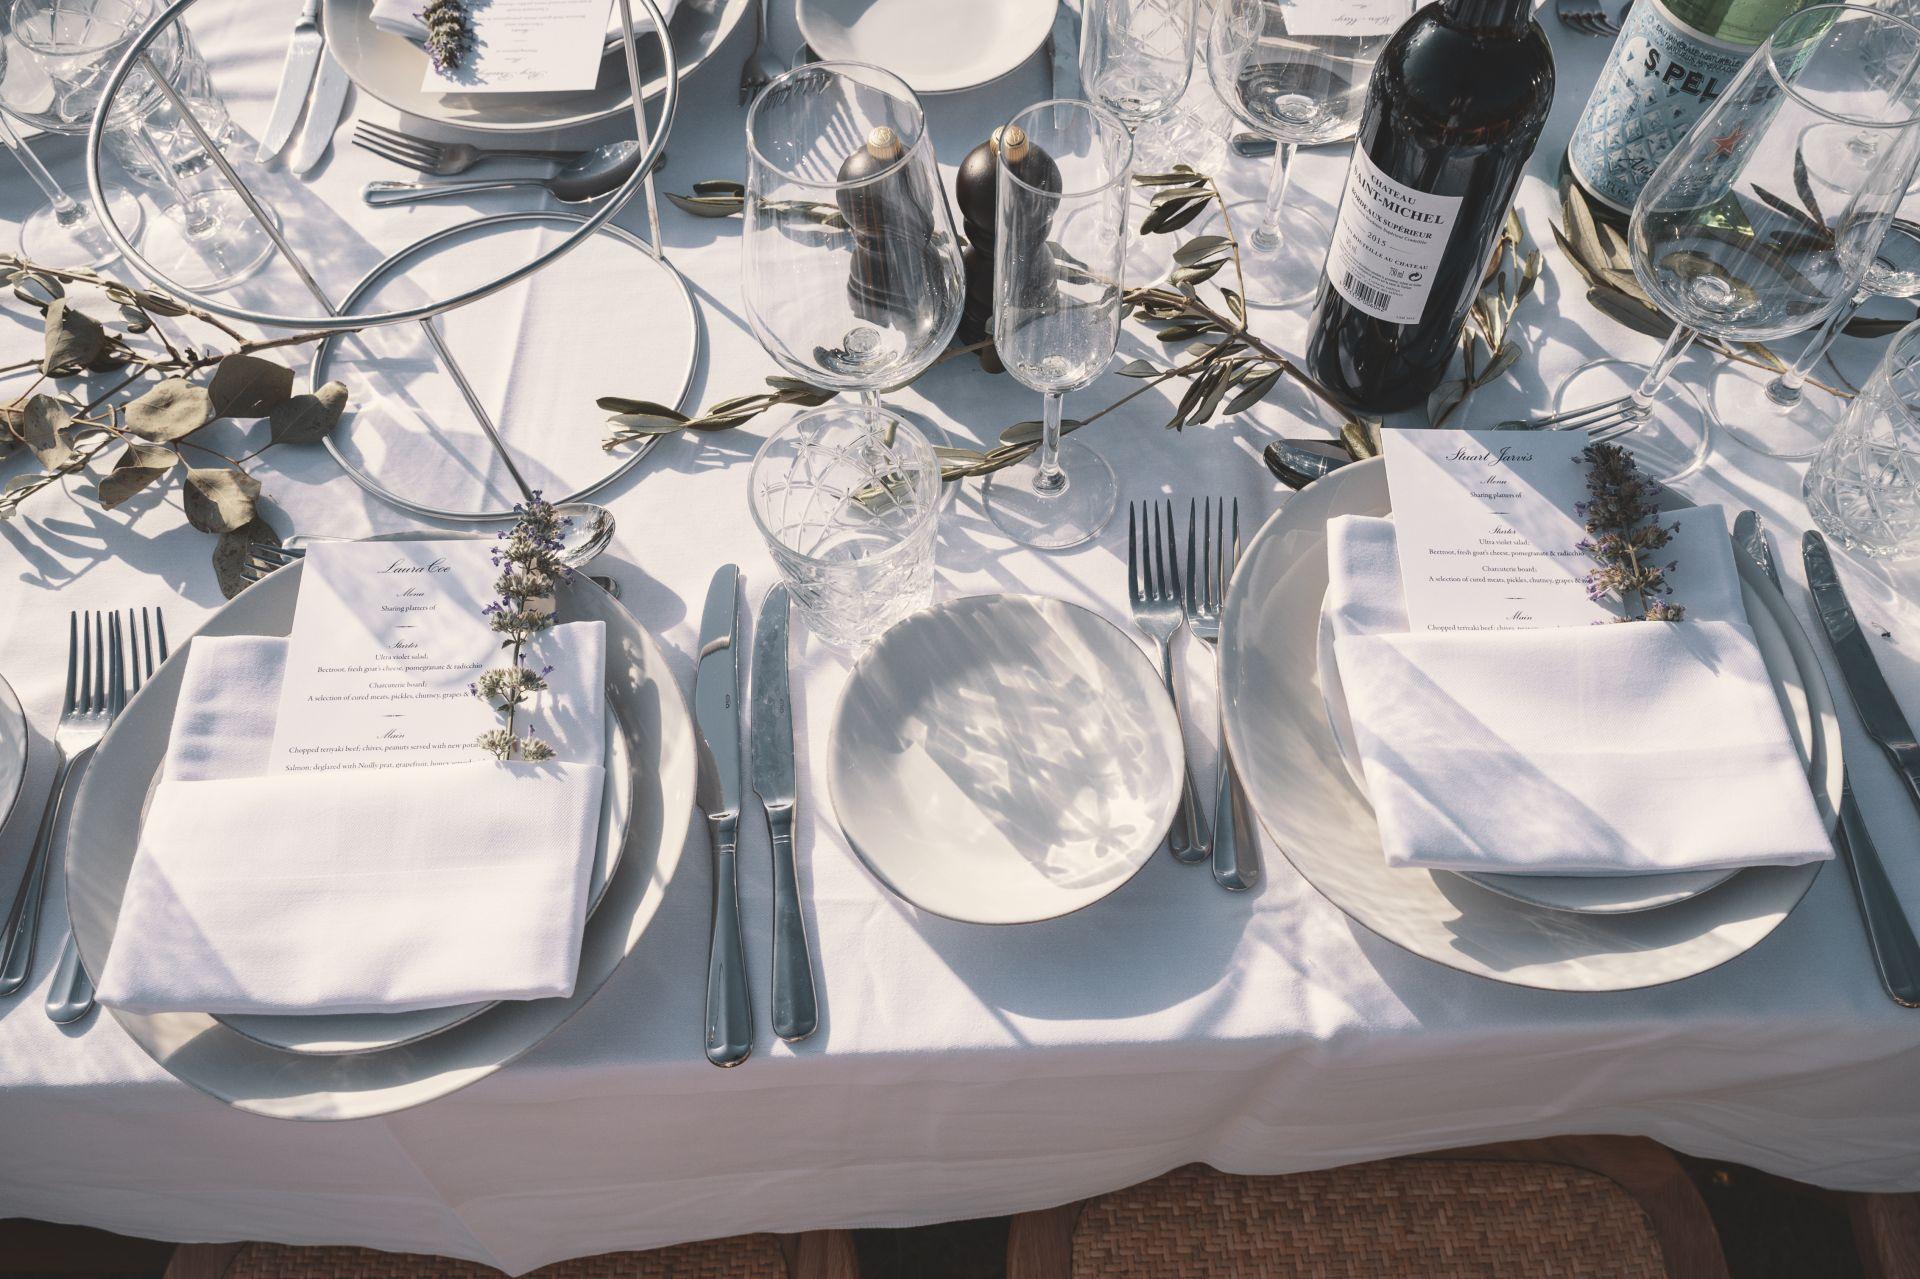 La Vue France - Wedding Breakfast- Table Setting - StuJarvis.com